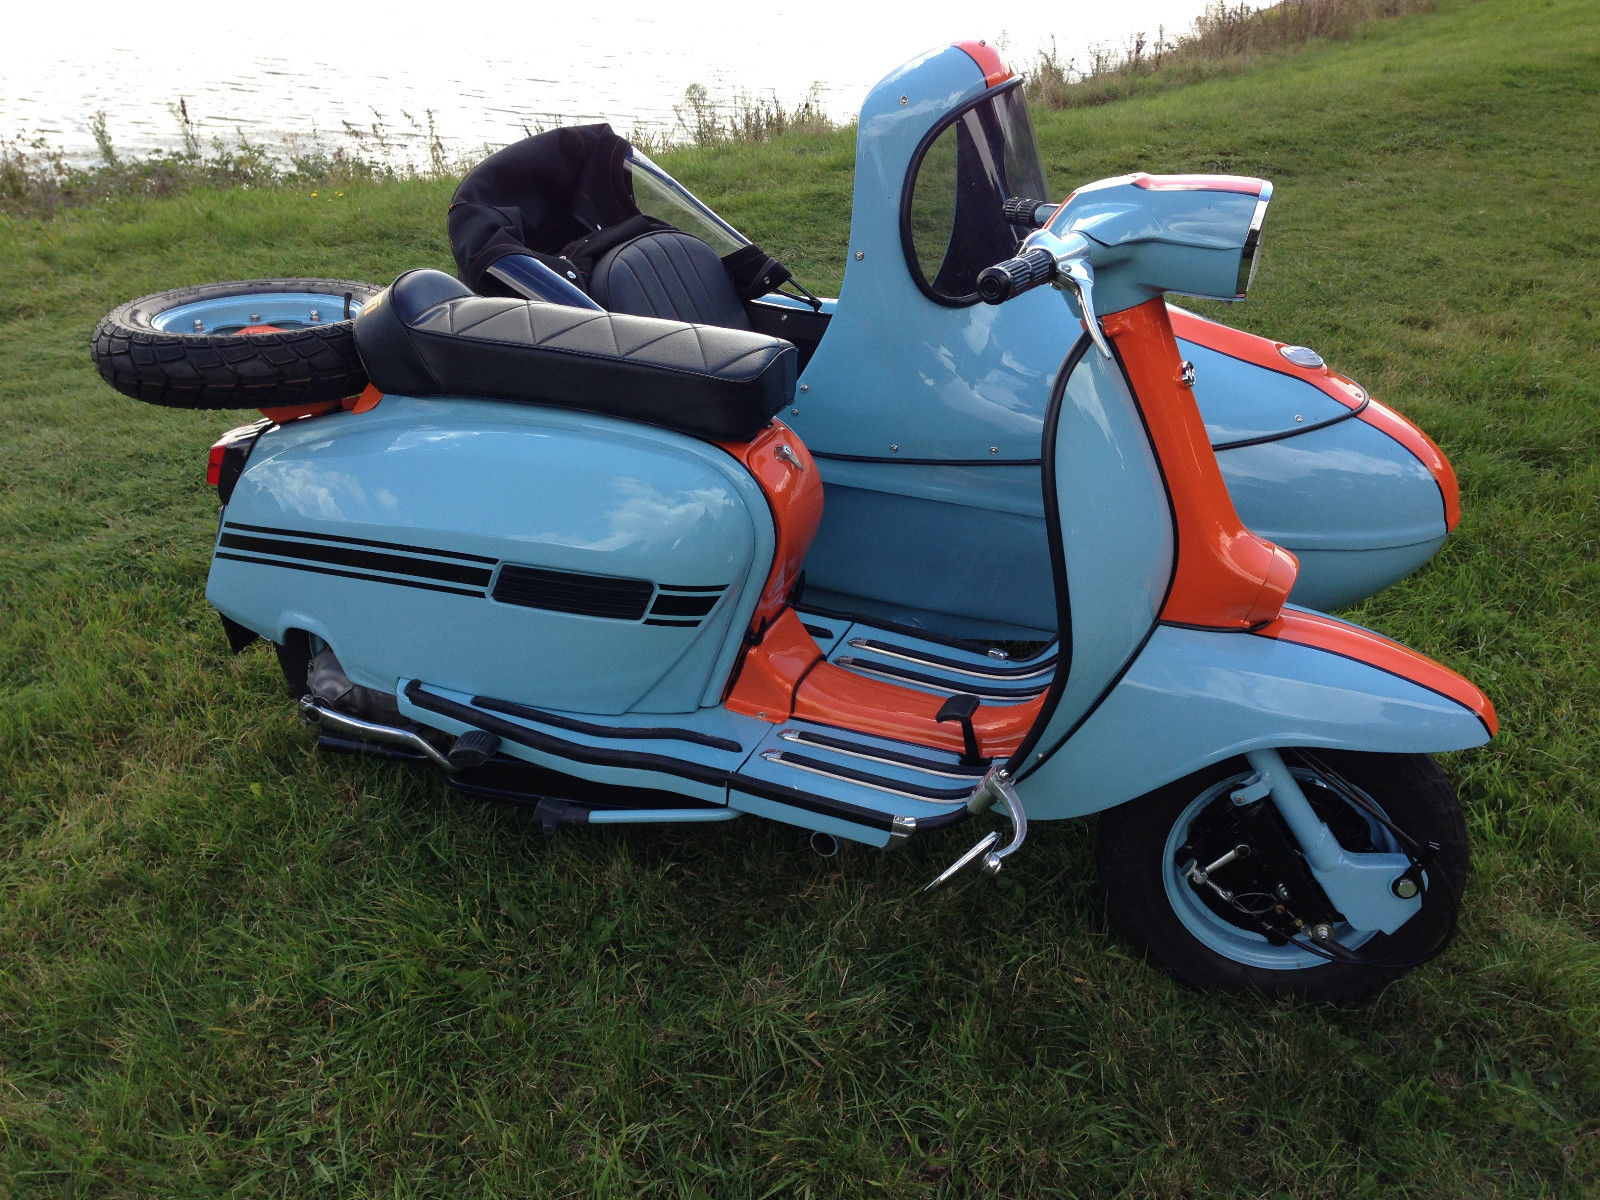 Gulf Racing themed Lambretta Sidecar COmbination